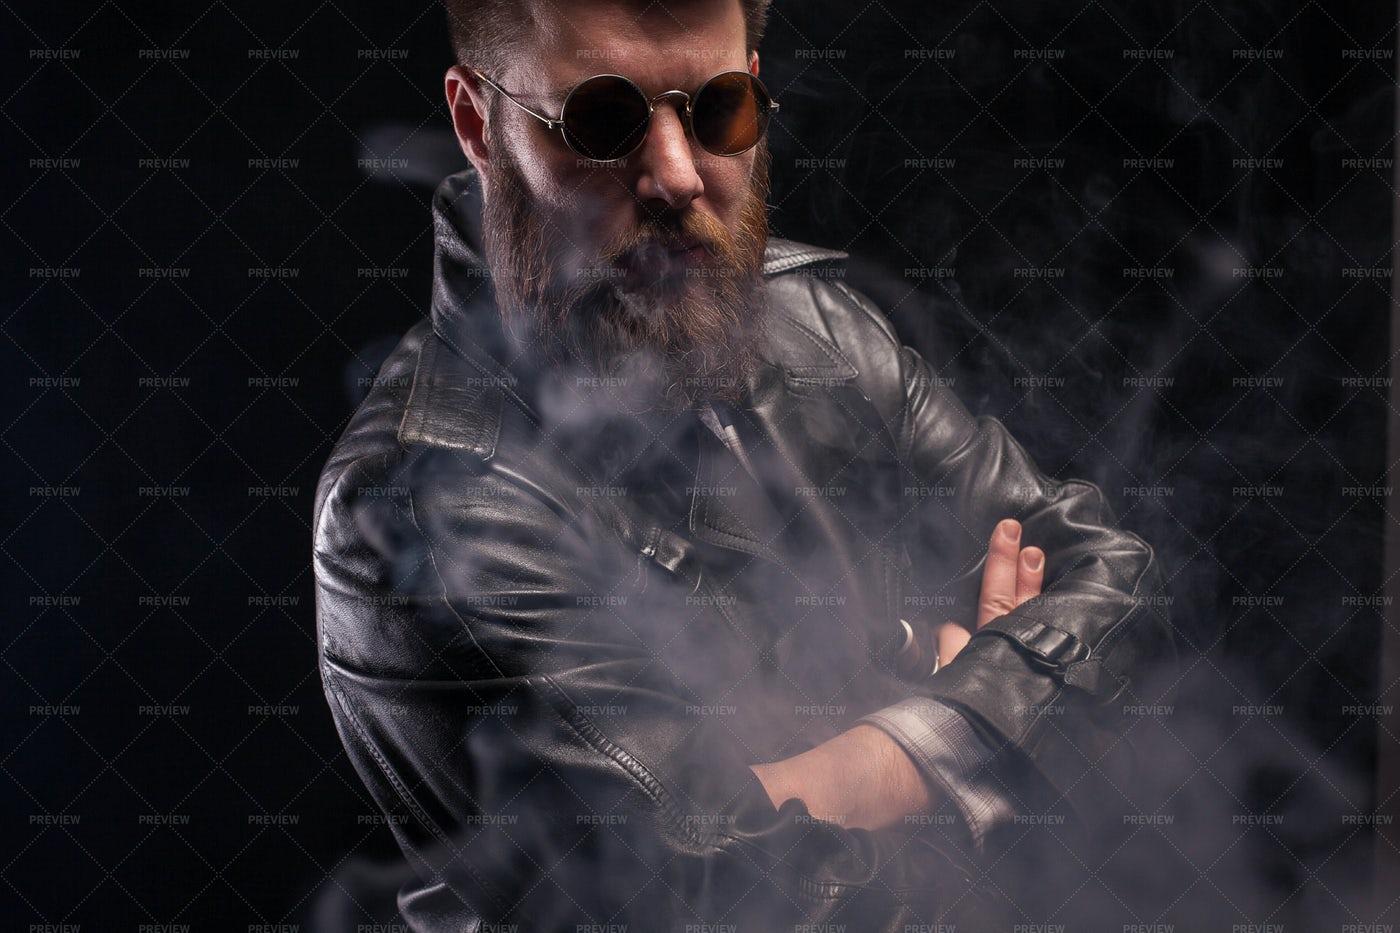 Man In Smoke Cloud: Stock Photos